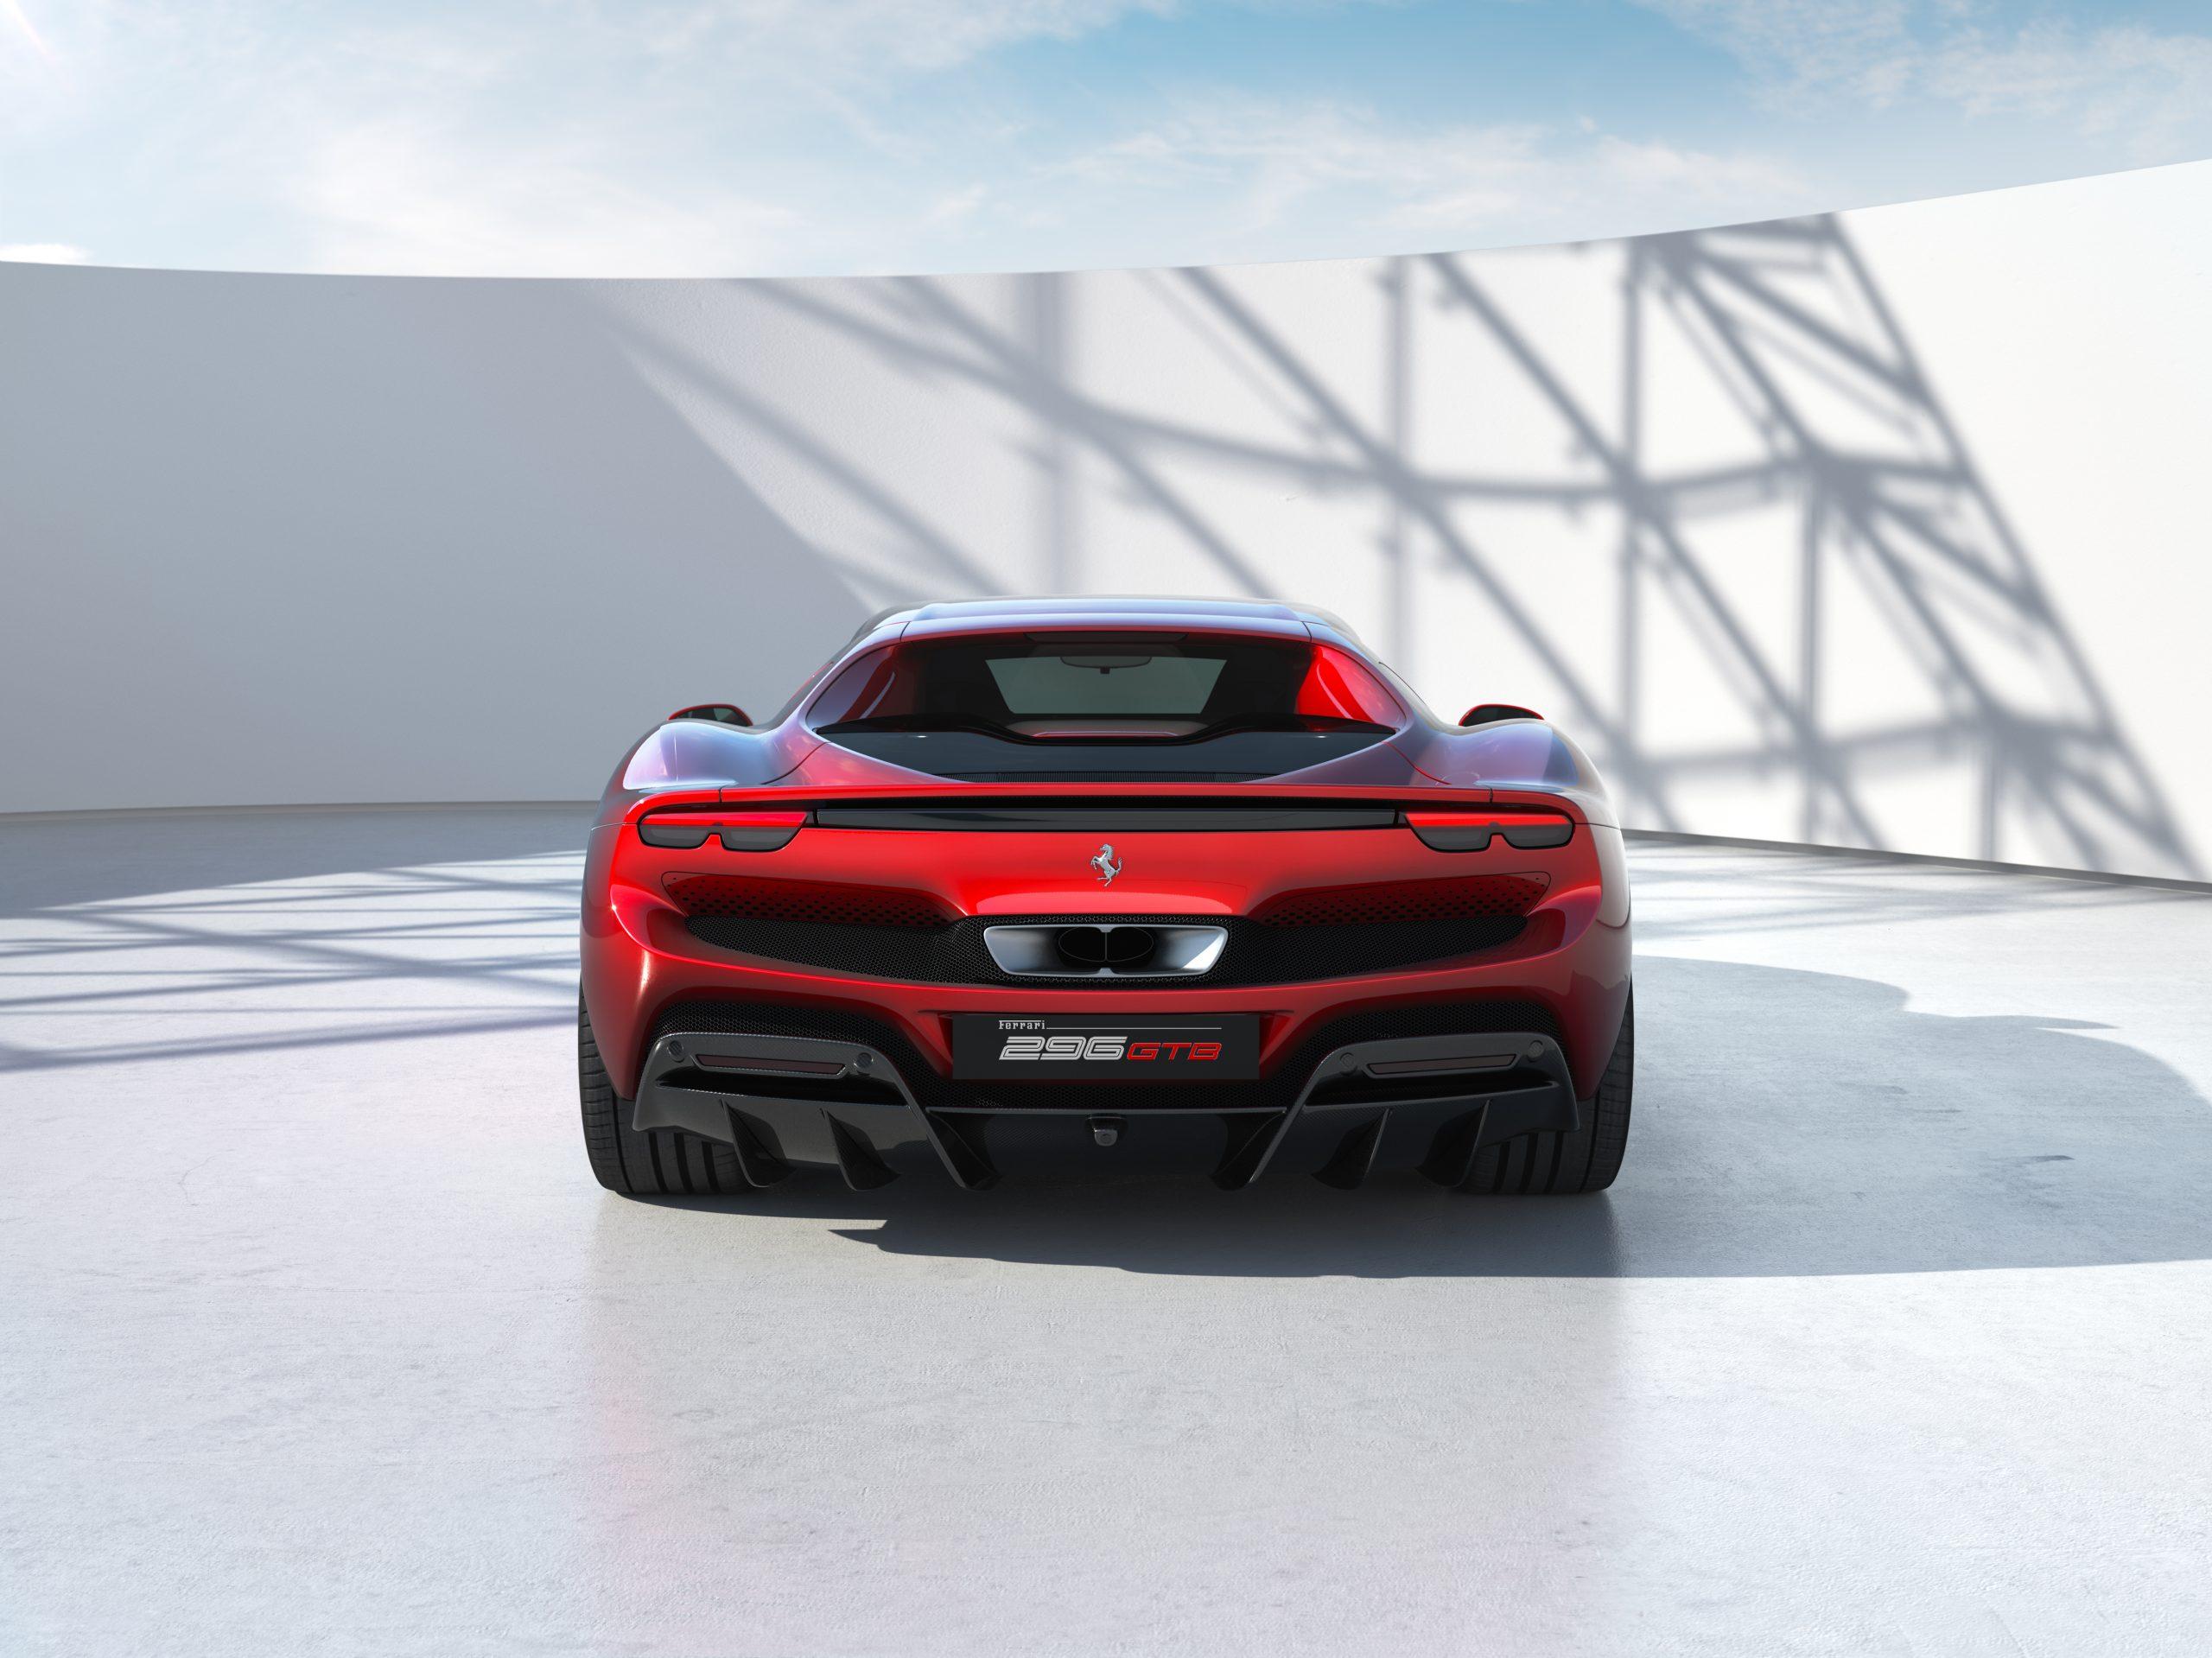 05 296 GTB post scaled Αυτή είναι η νέα Ferrari 296GTB 296GTB, Ferrari, Ferrari 296GTB, supercar, supercars, zblog, ειδήσεις, Νέα